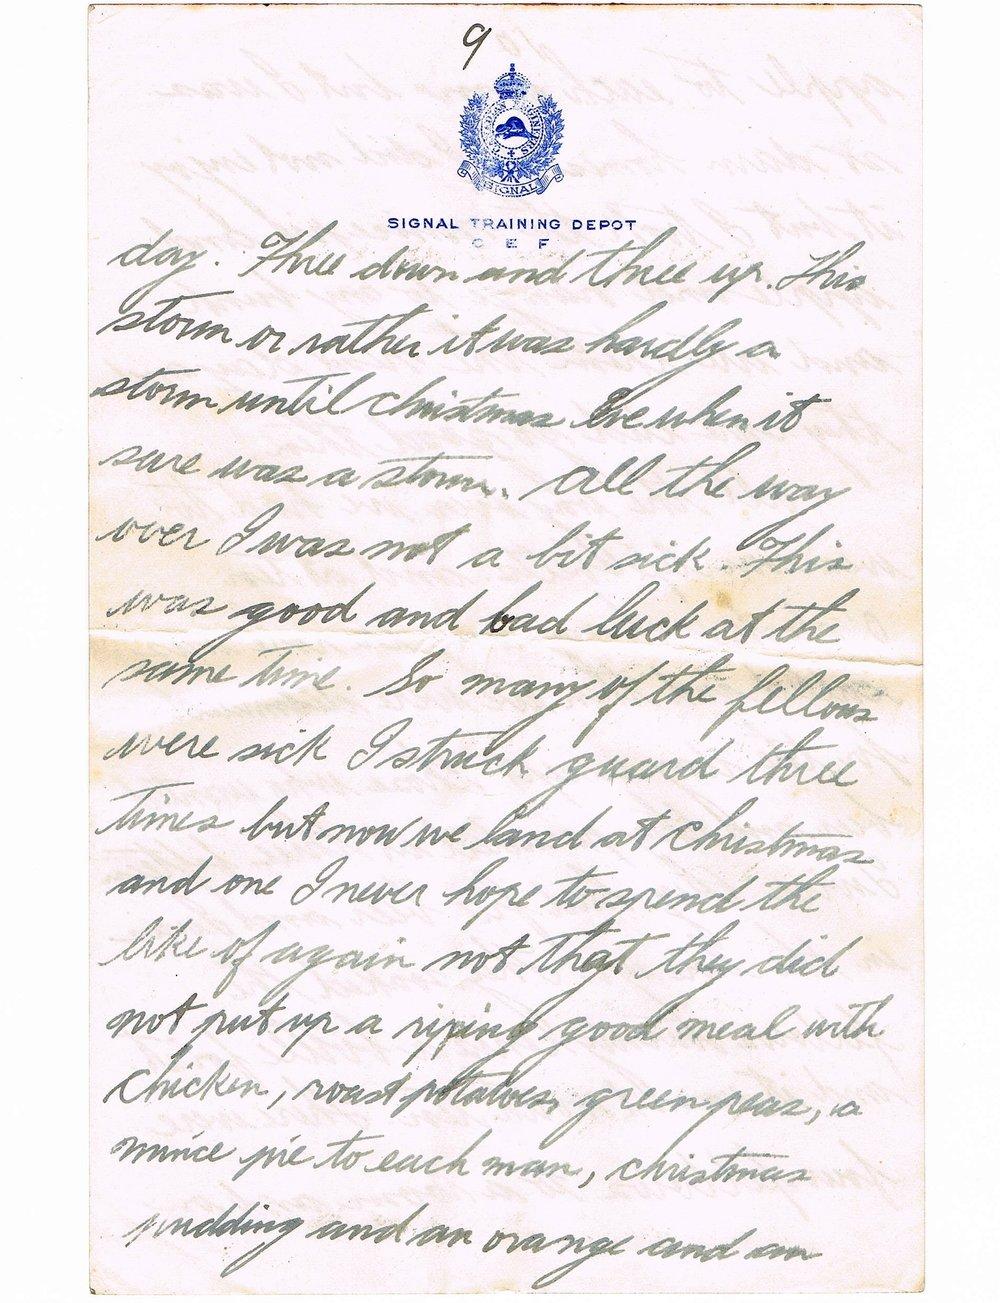 Basil Vale January 2, 1918 letter - page 9.jpg